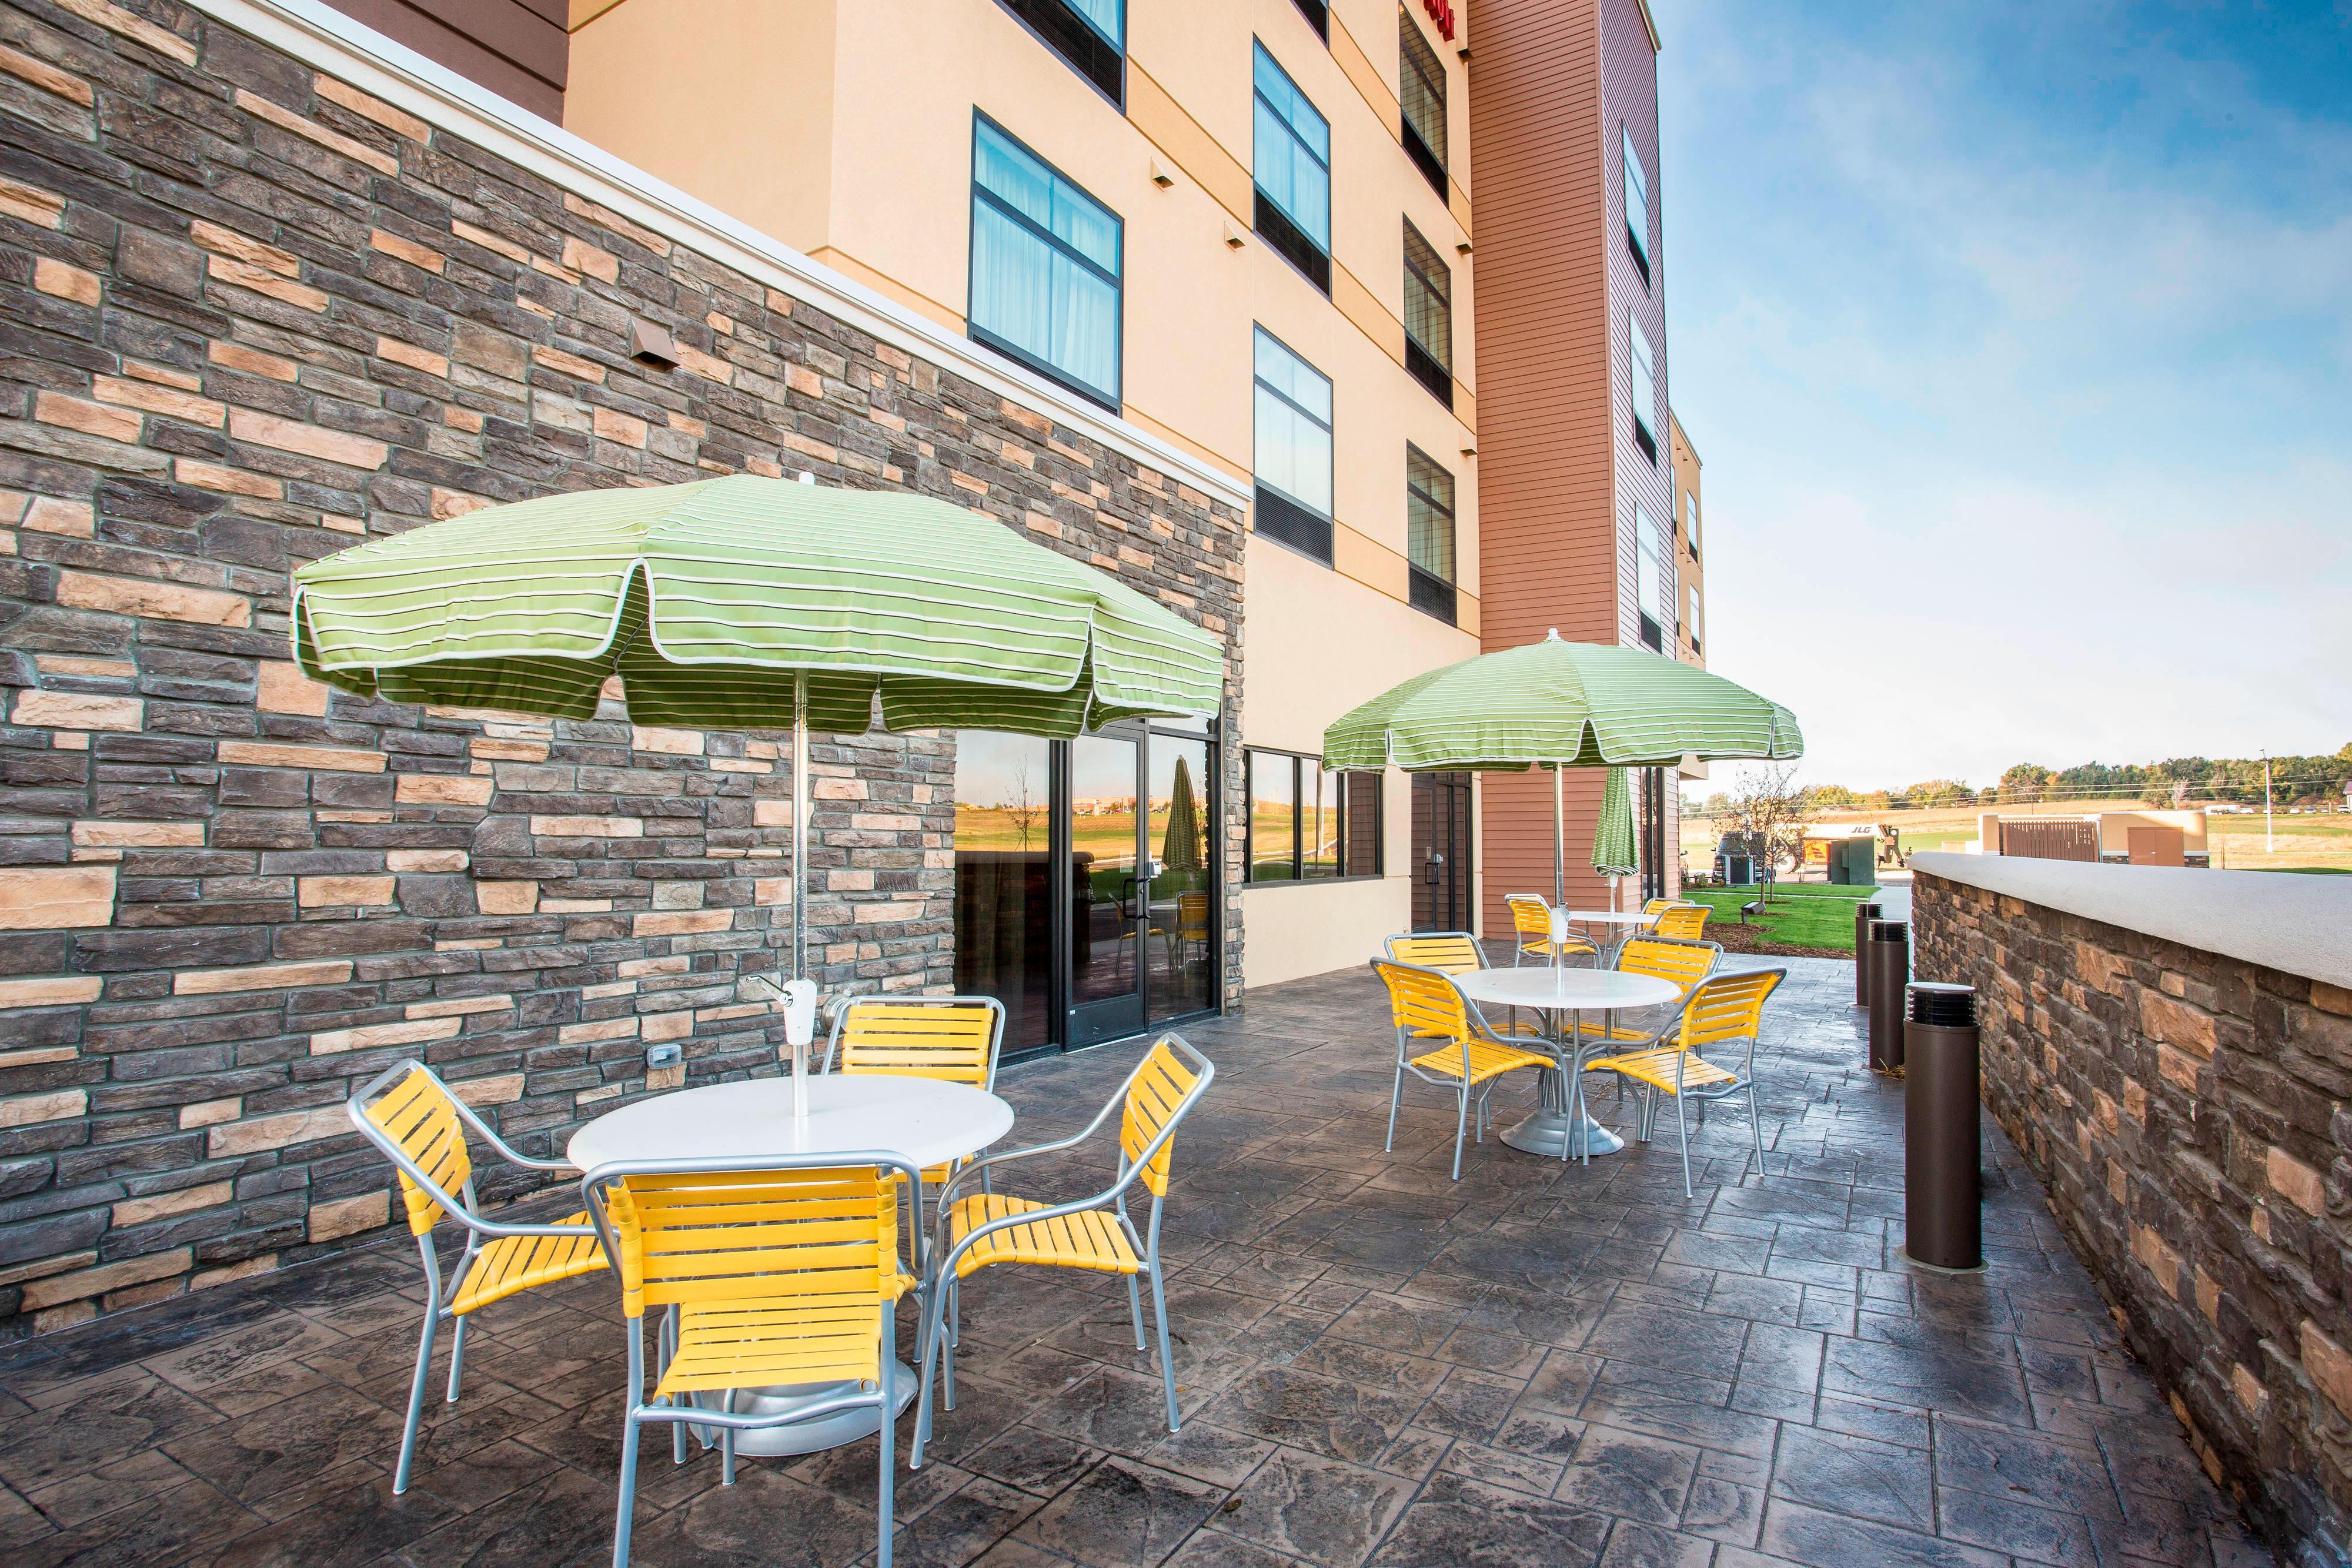 Fairfield Inn & Suites By Marriott Sioux Falls Airport